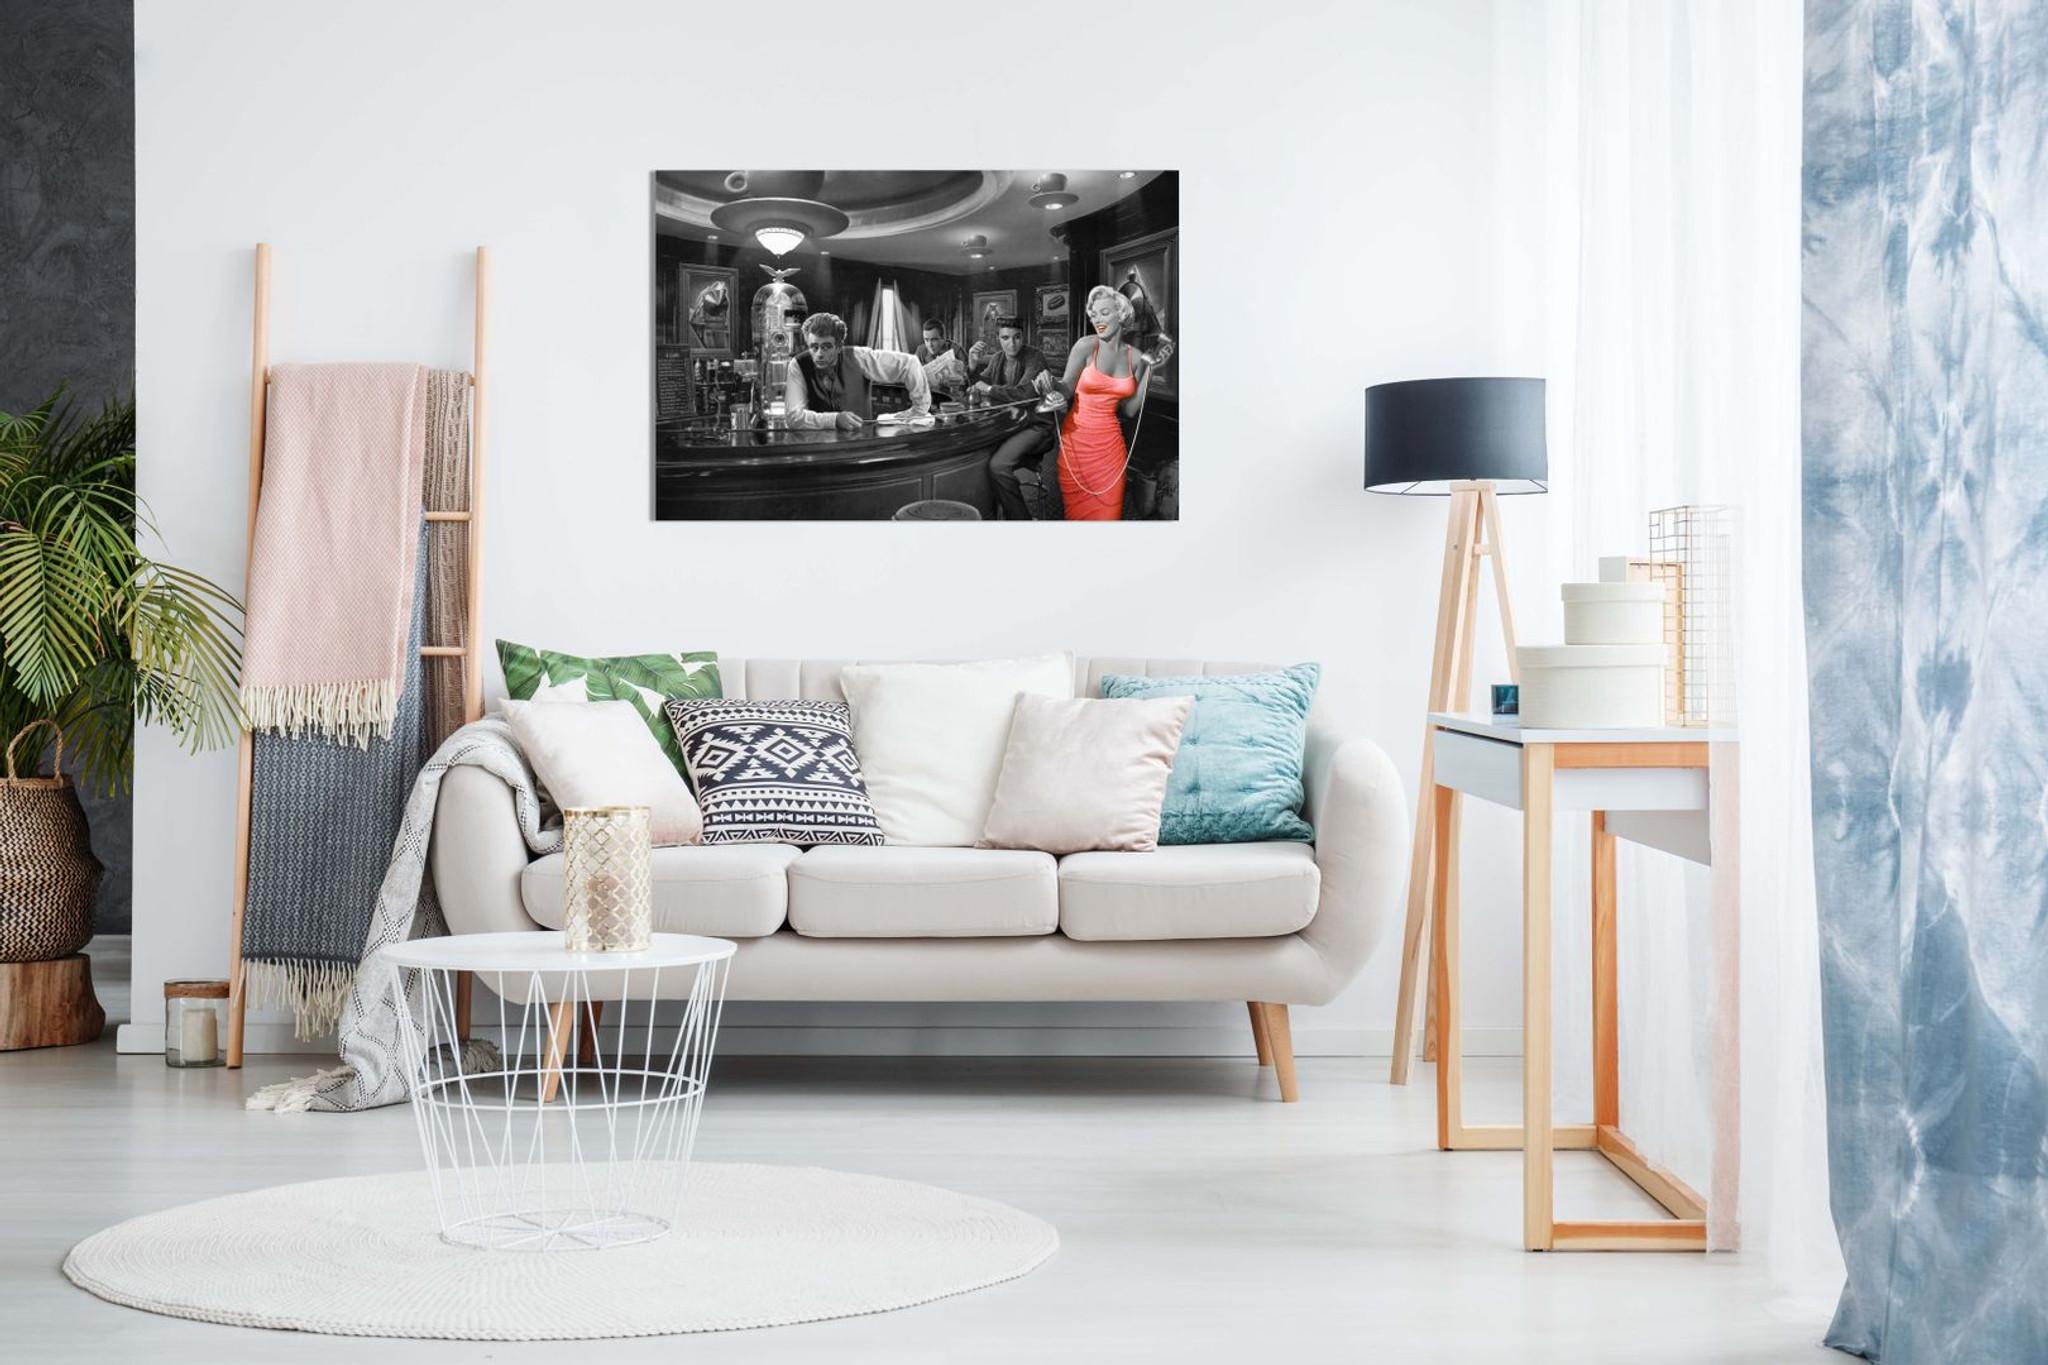 36x24in Marilyn Monroe Elvis Presley James Dean Red Dress Black /& White Canvas Wall Art Picture Print